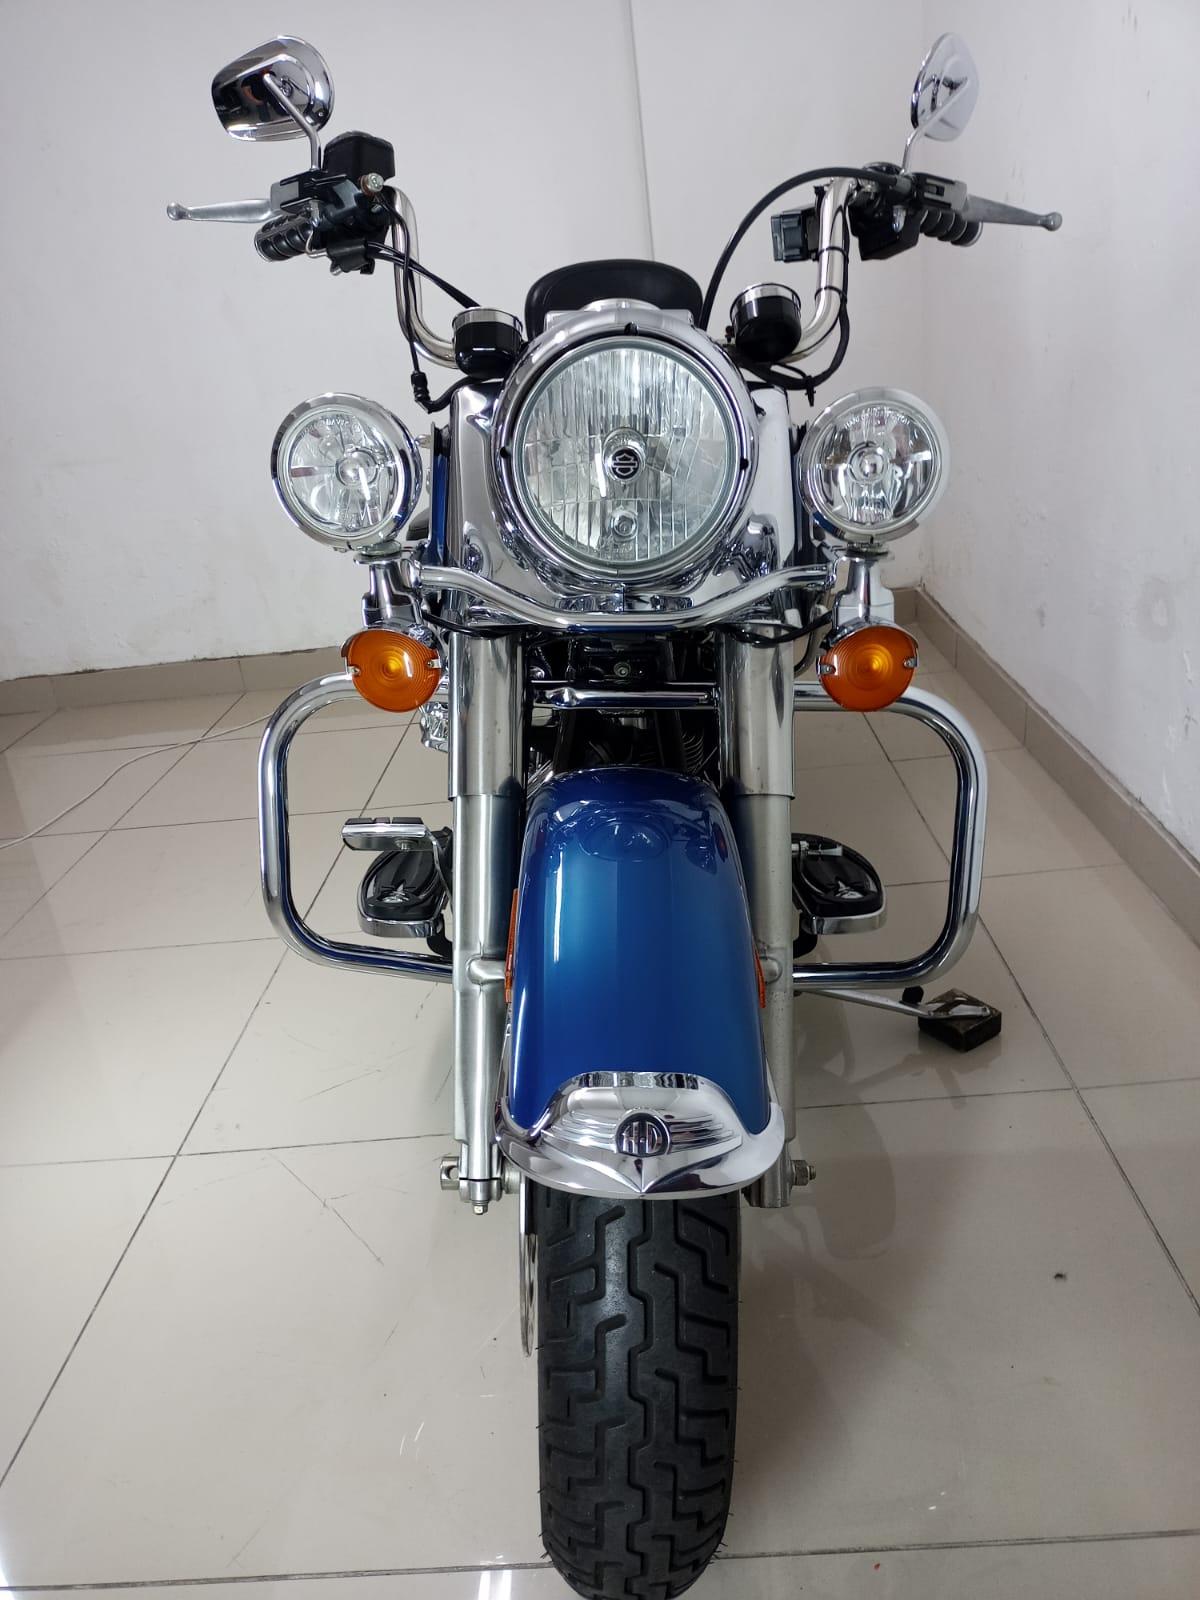 2006 Harley Davidson Road King